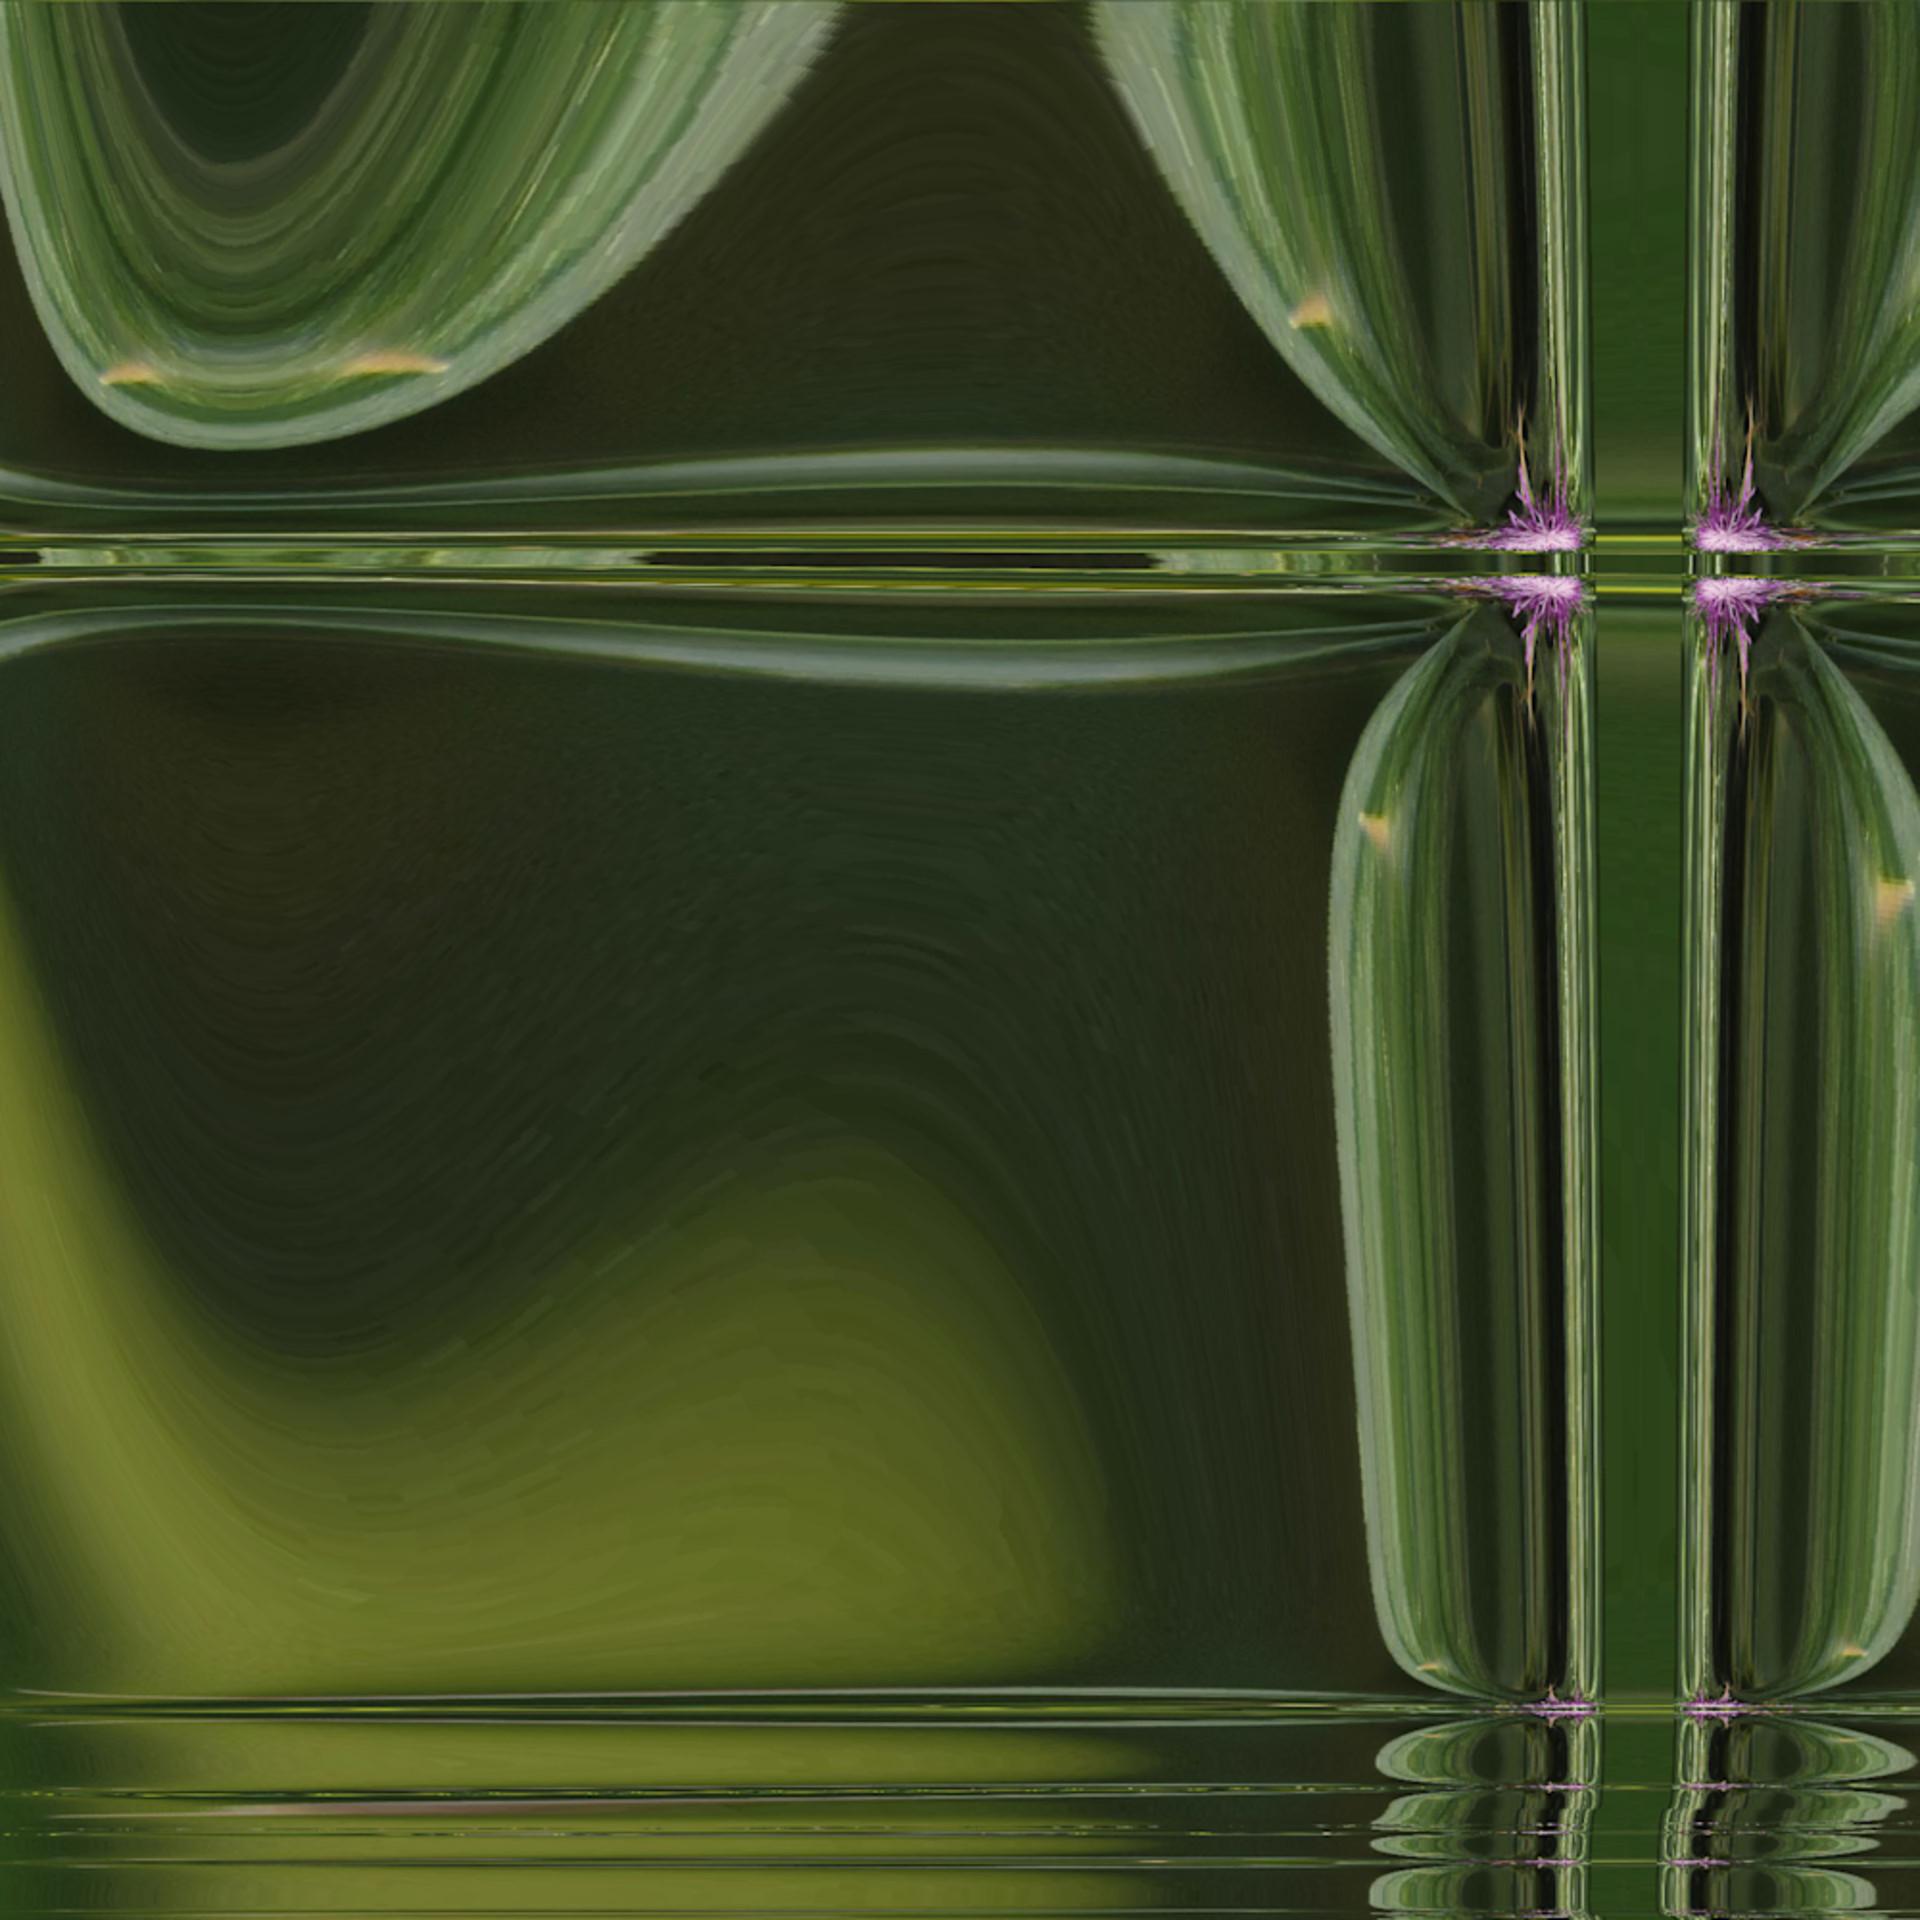 Glassine structures i wuwwuo